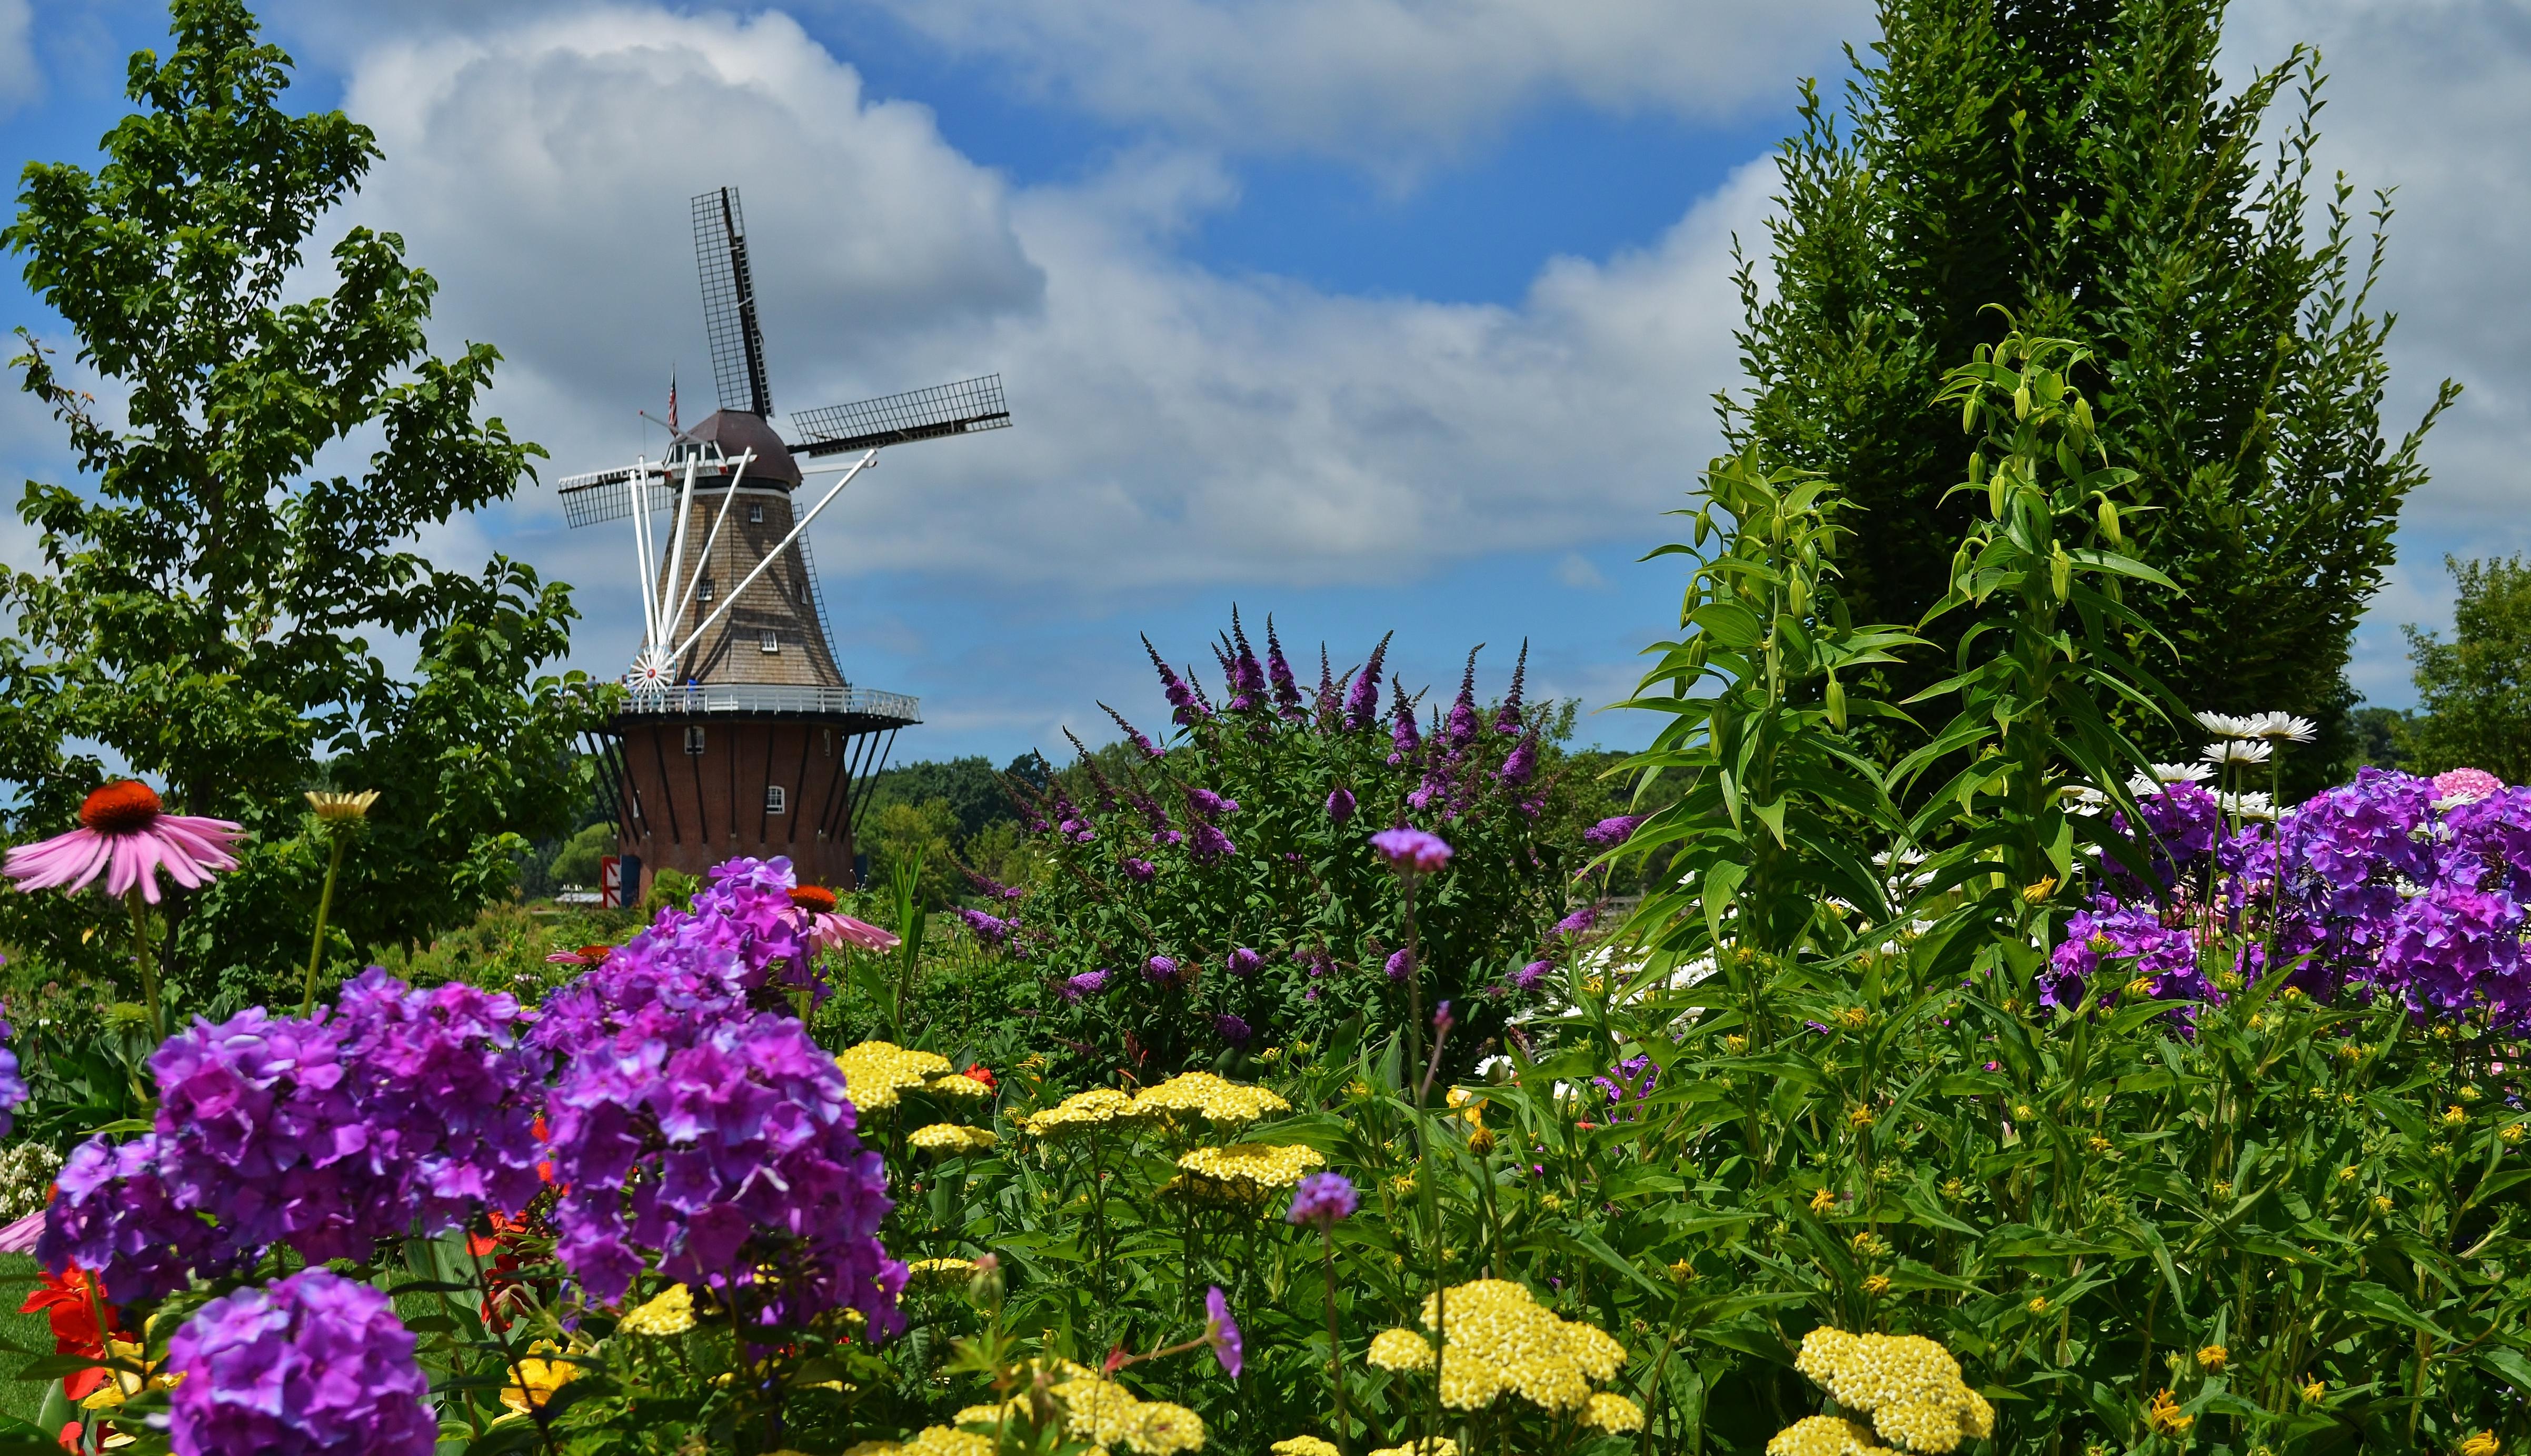 Take a Look Inside DeZwaan Windmill in Holland, Michigan